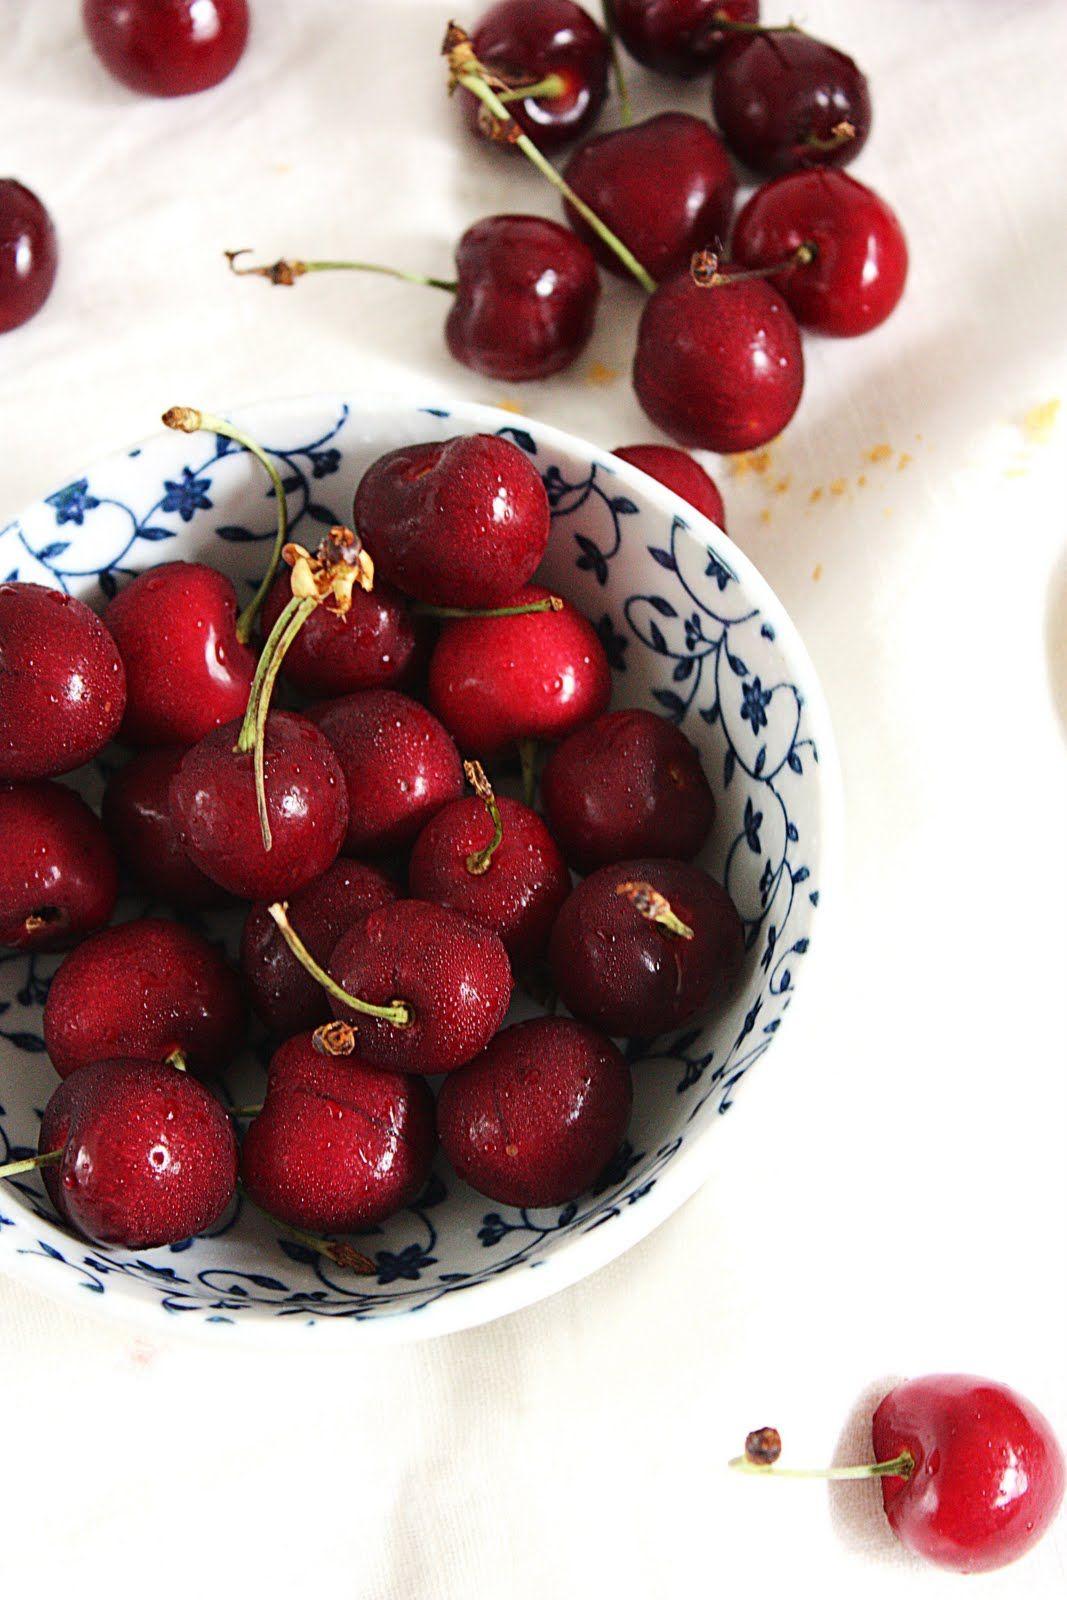 ...Eat more fresh fruit!